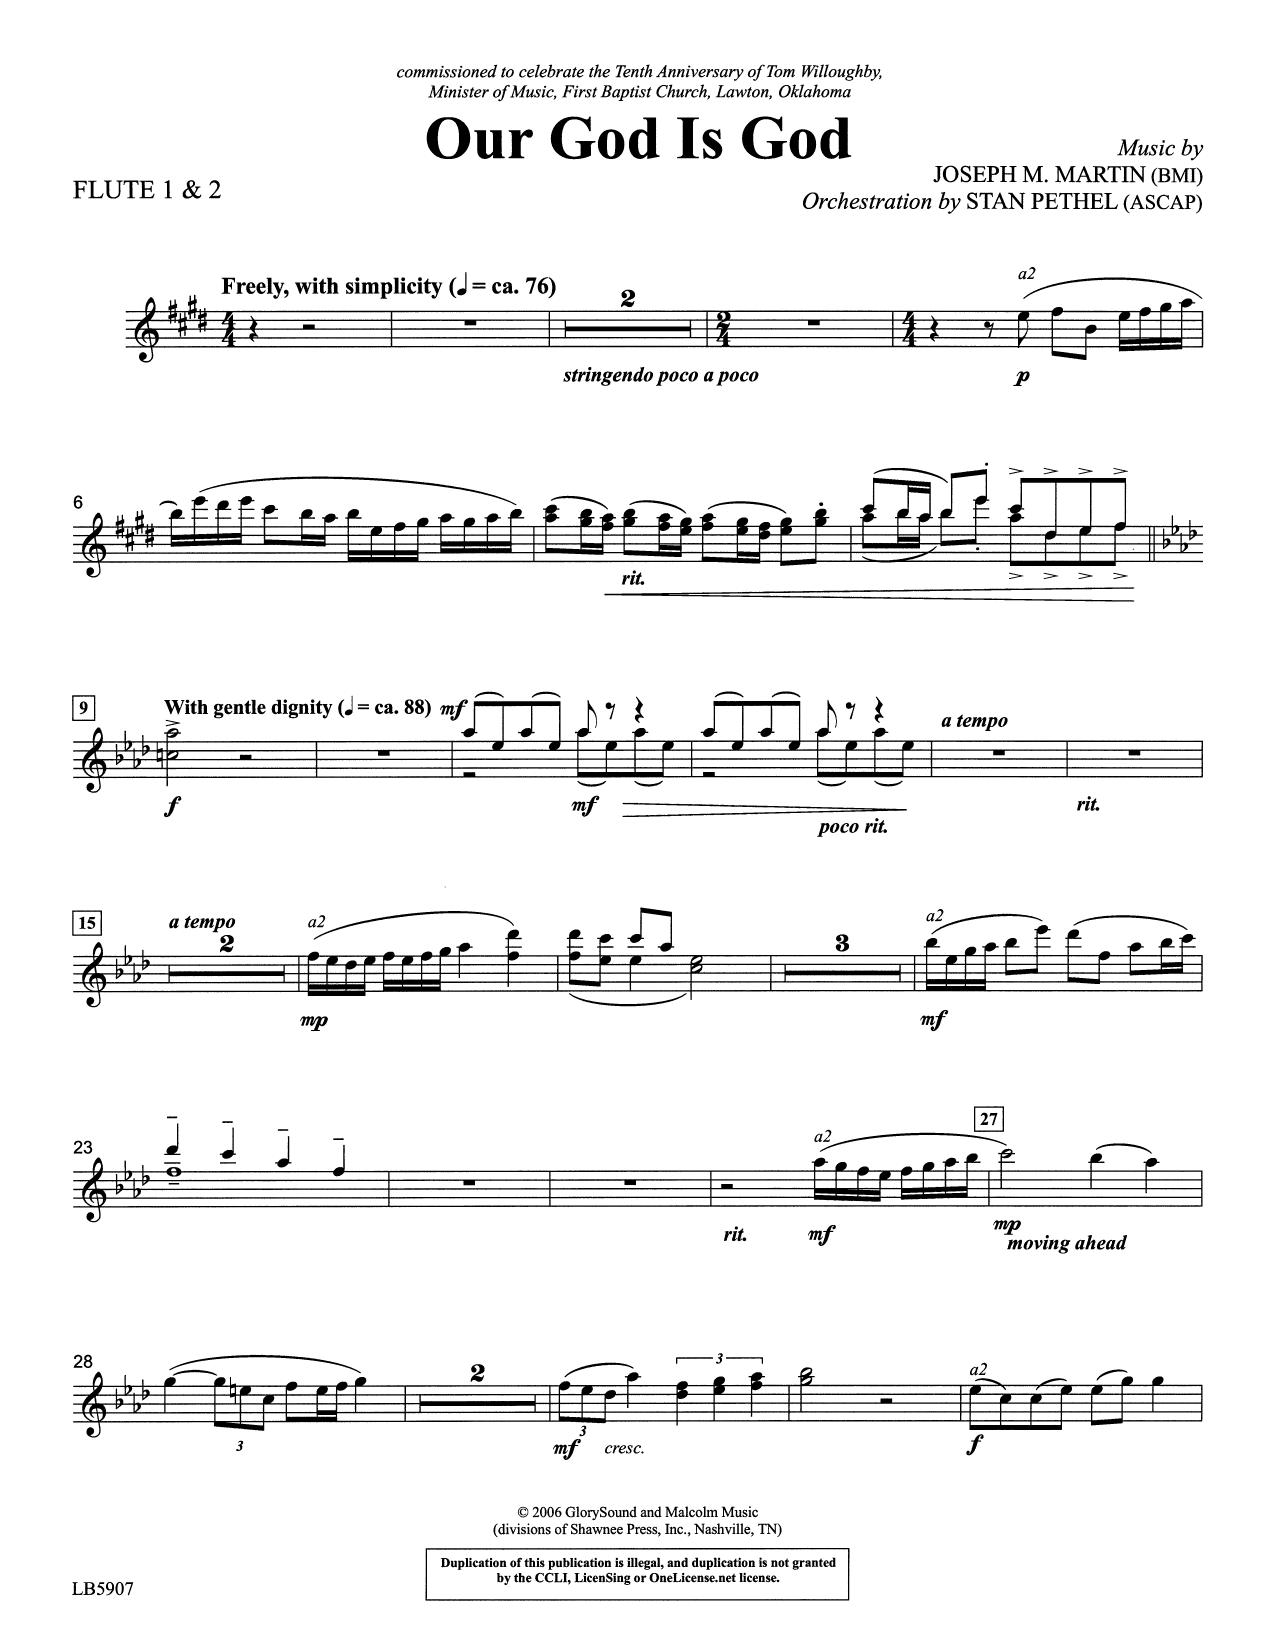 Our God Is God - 1st & 2nd Flute